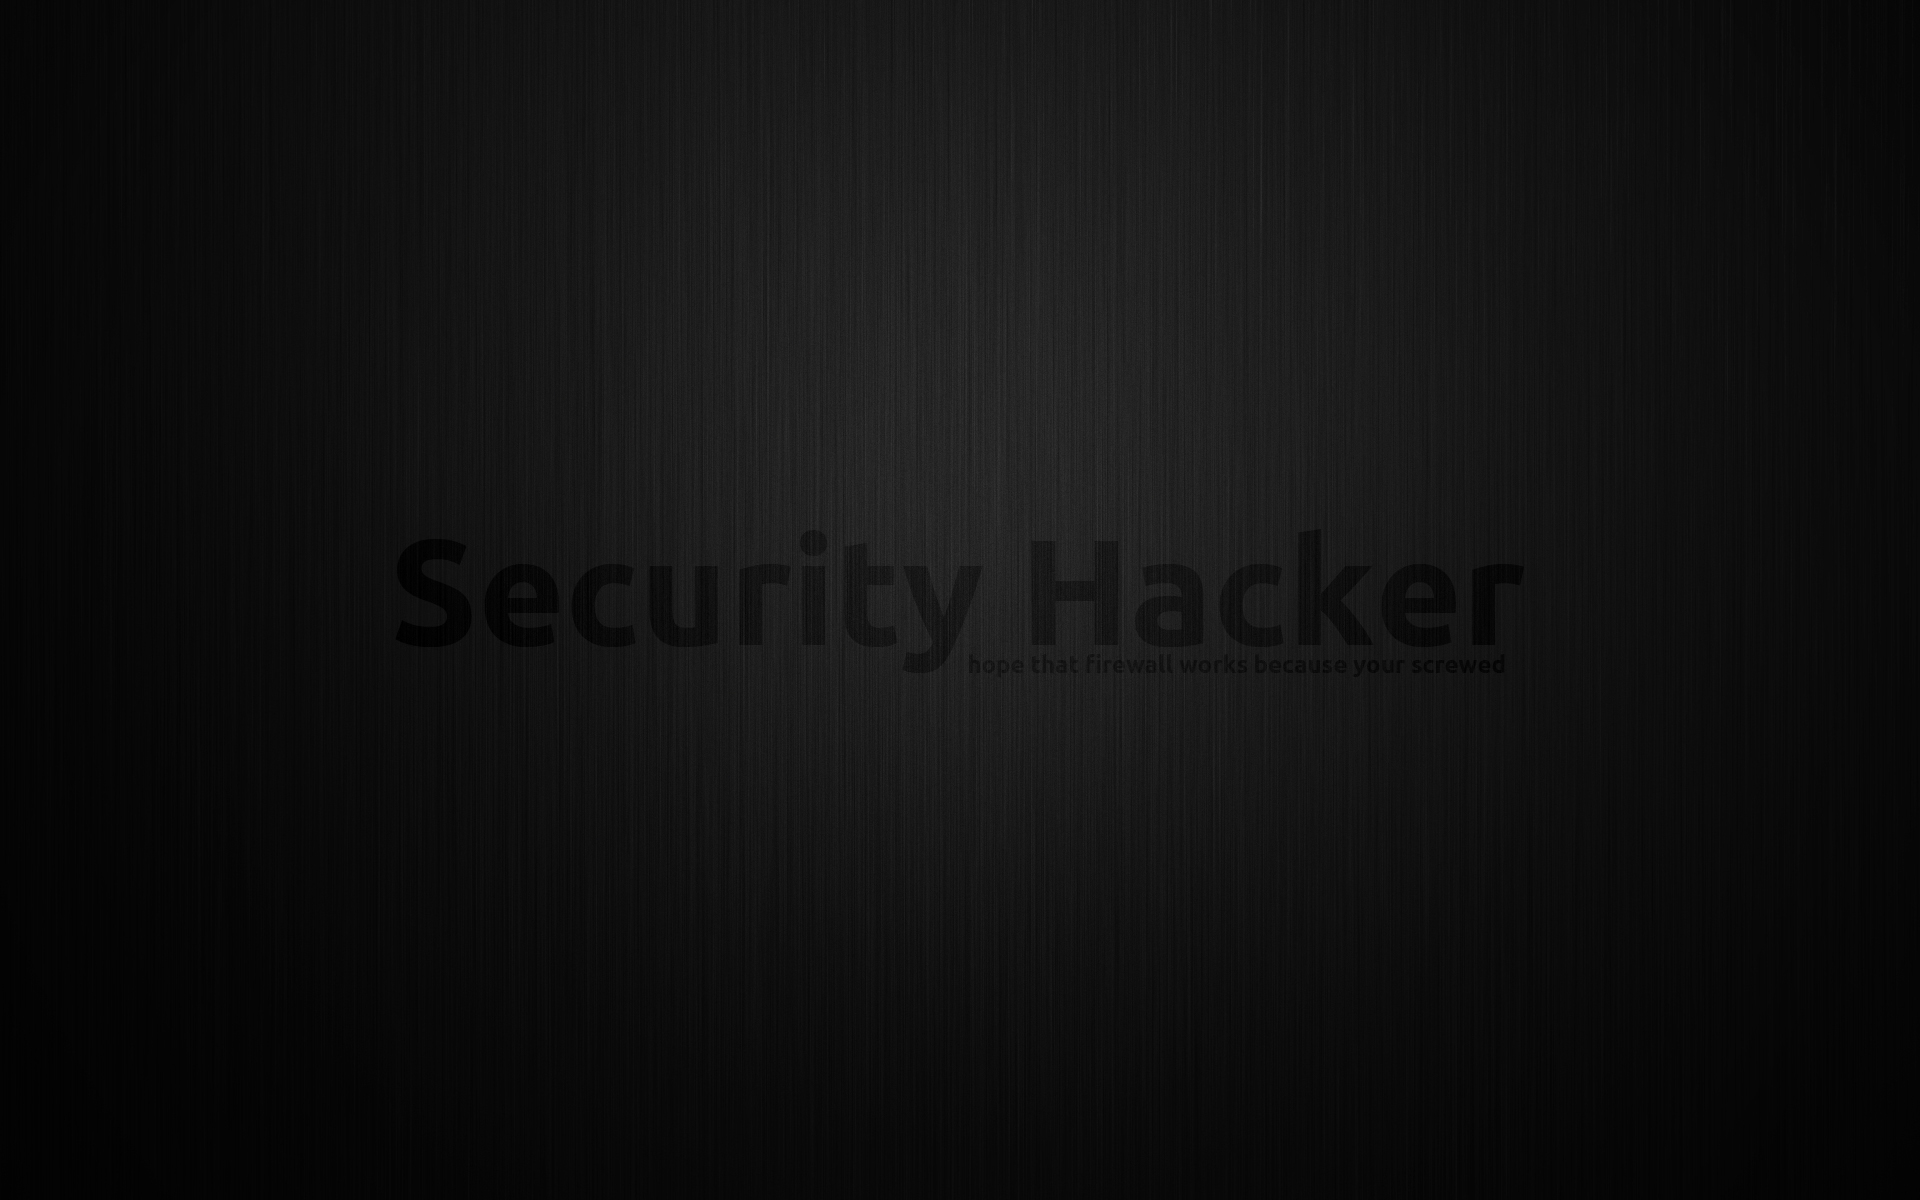 Cm Security Hd Wallpapers Best Hd Wallpaper